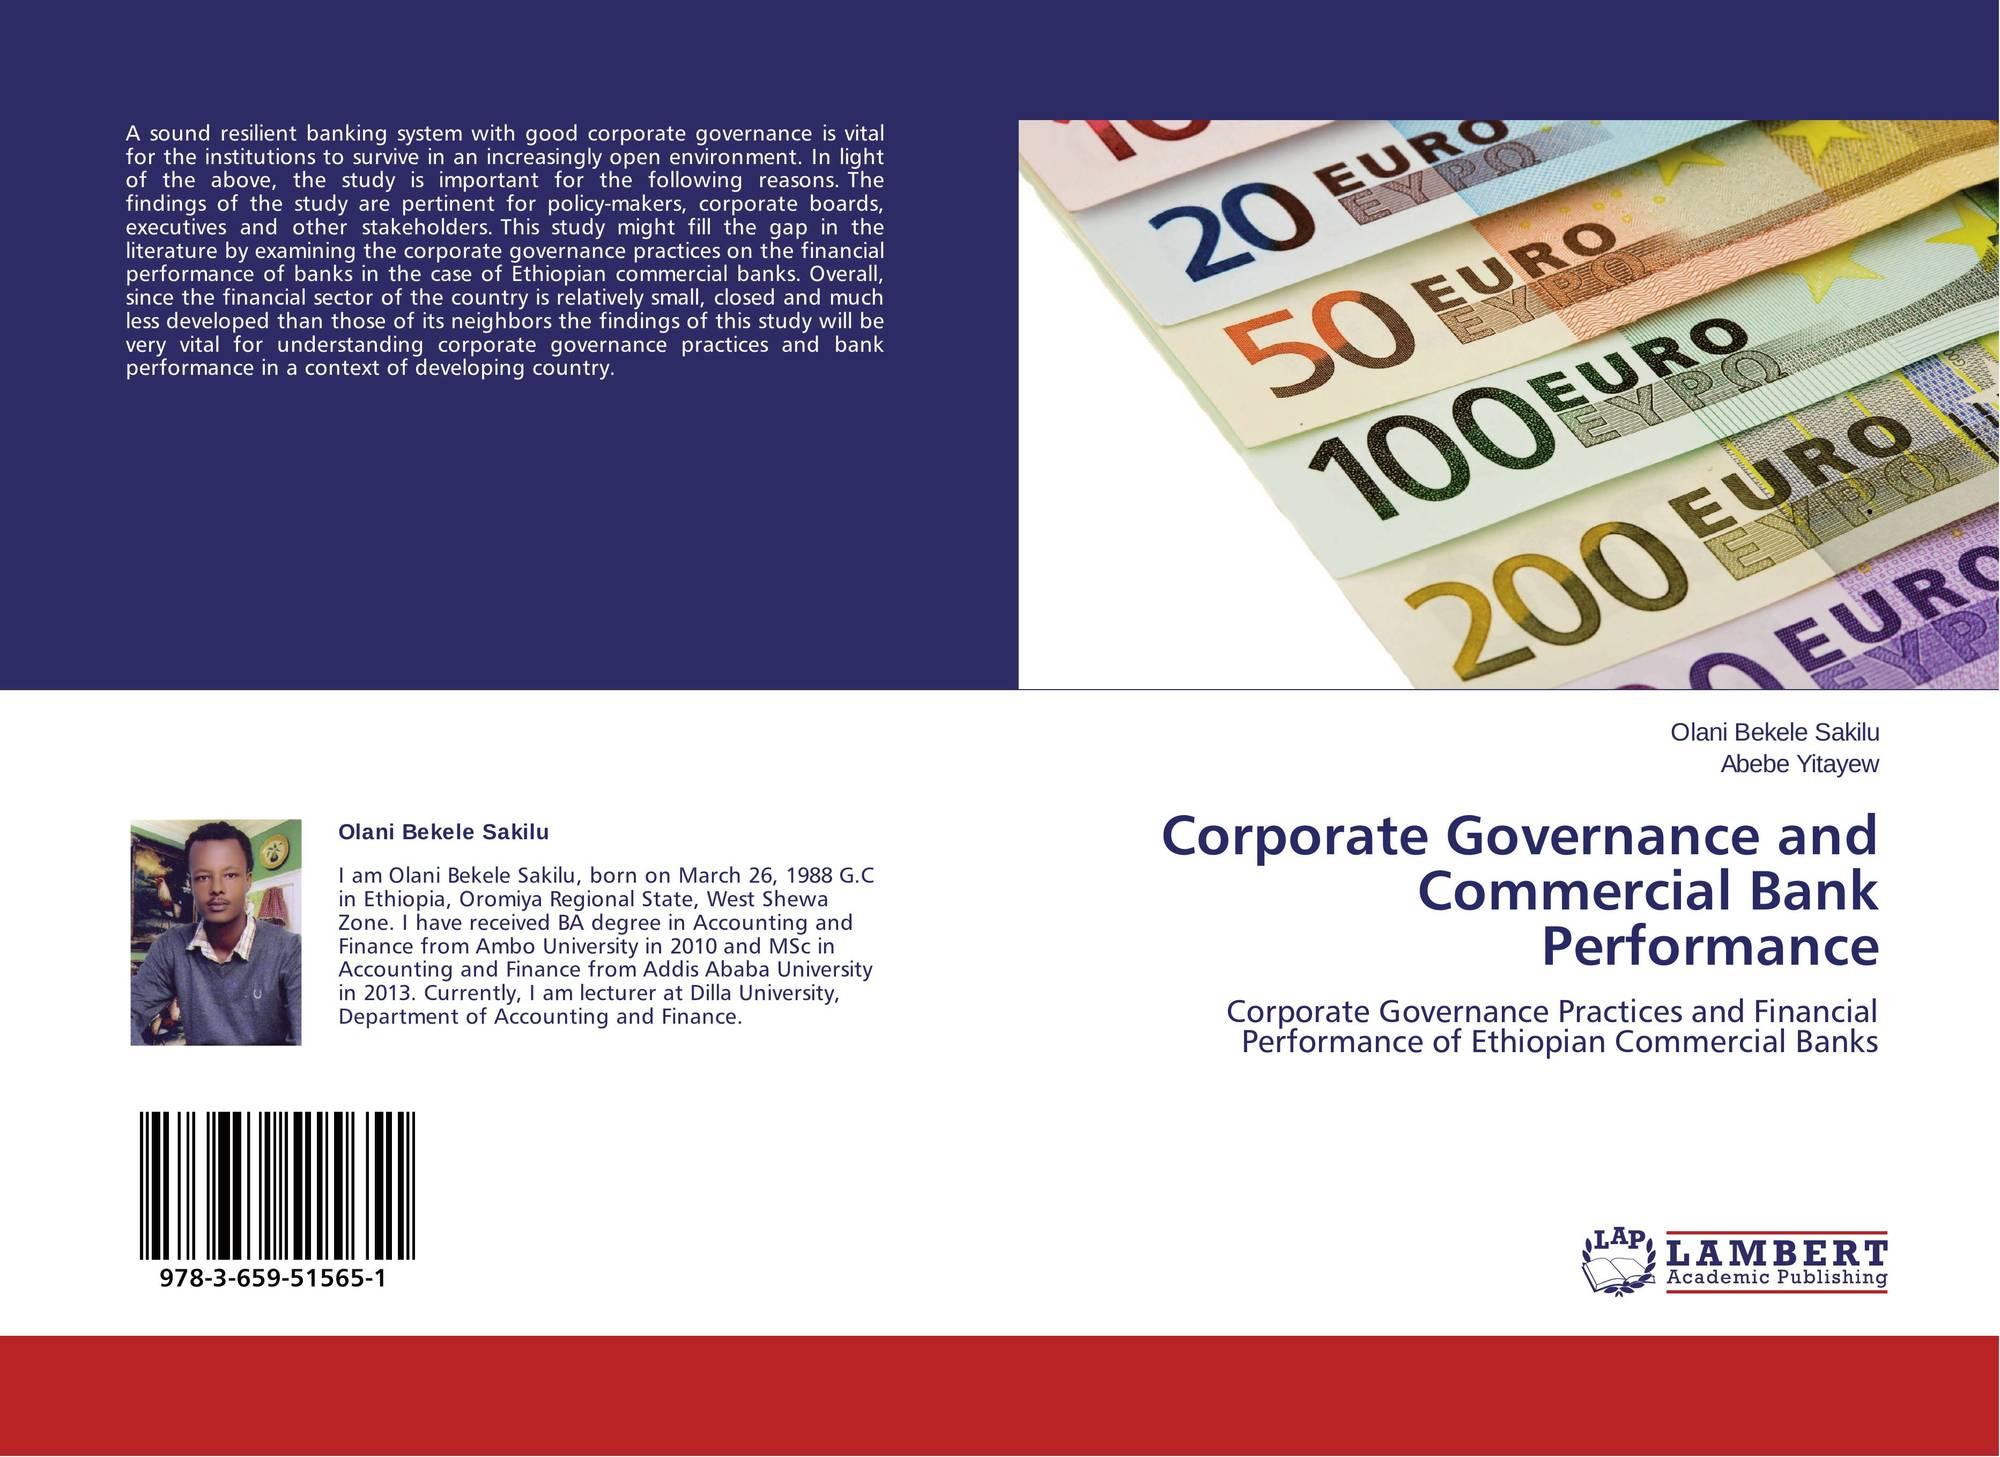 corporate governance performance Contents nzx corporate governance code 03 principle 1 – code of ethical behaviour 07 principle 2 – board composition & performance 09 principle 3.